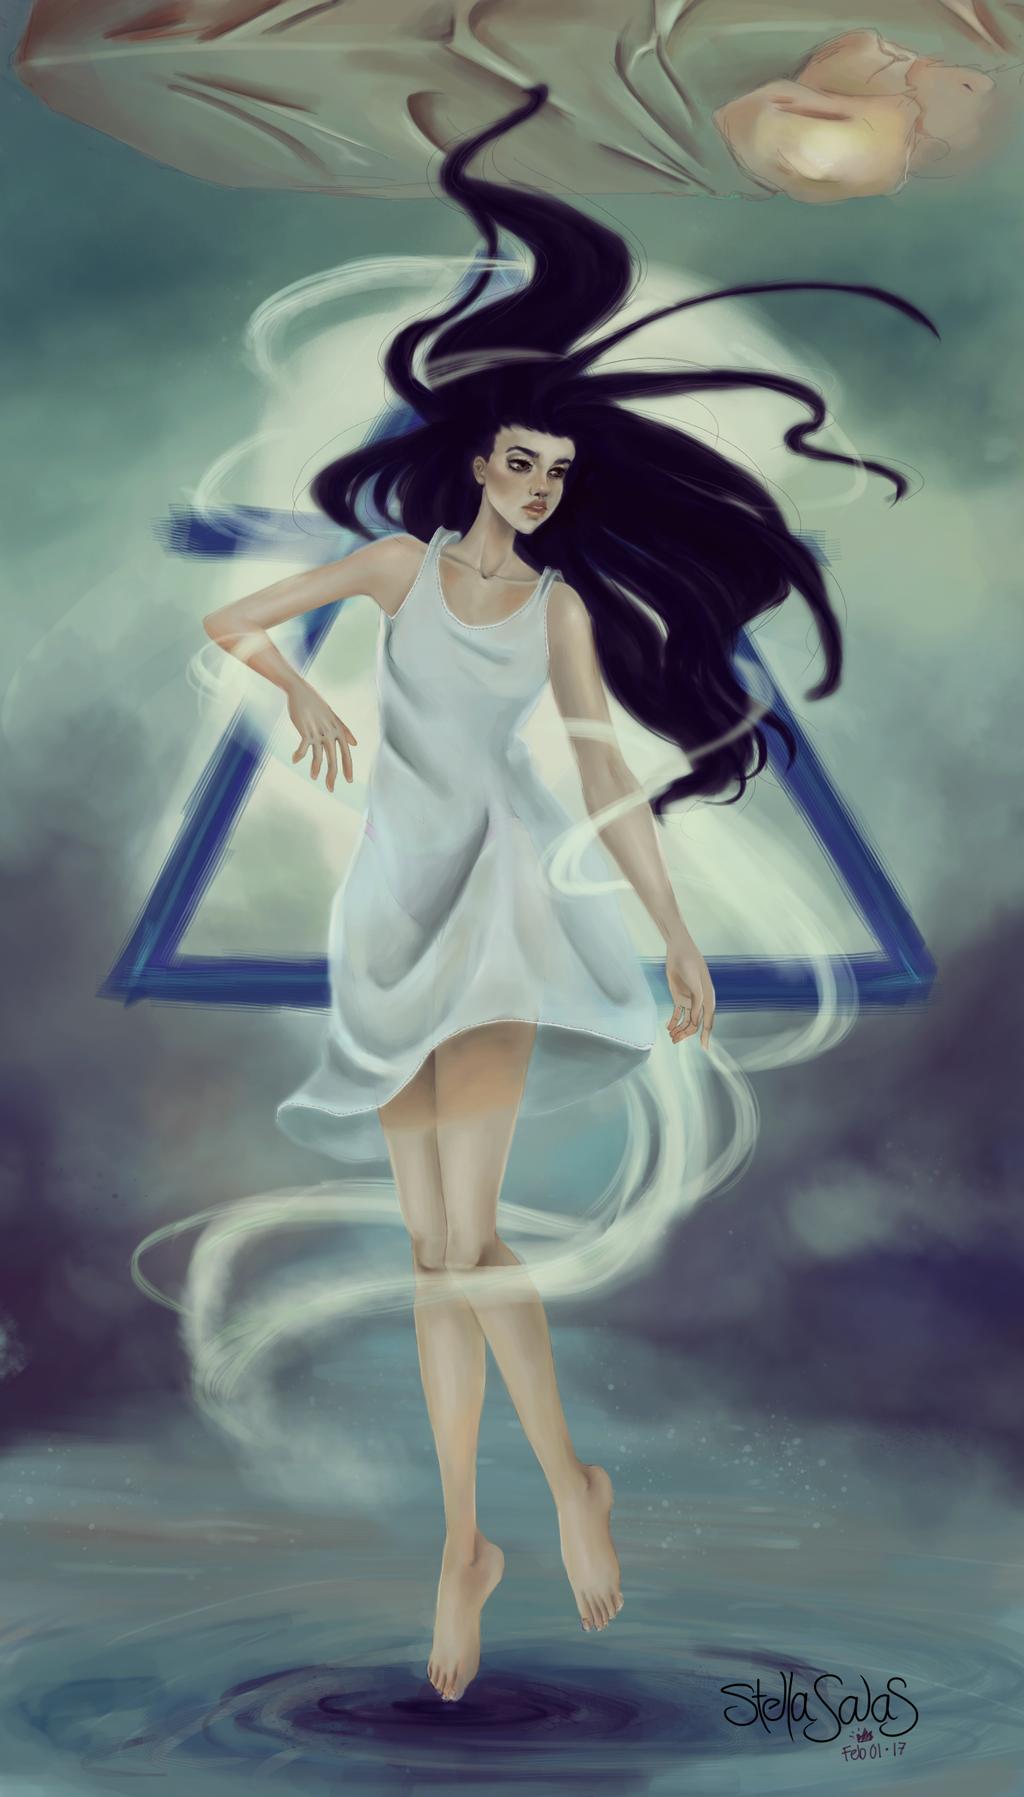 Aquarius, the sleepflyer by yo-sociopath